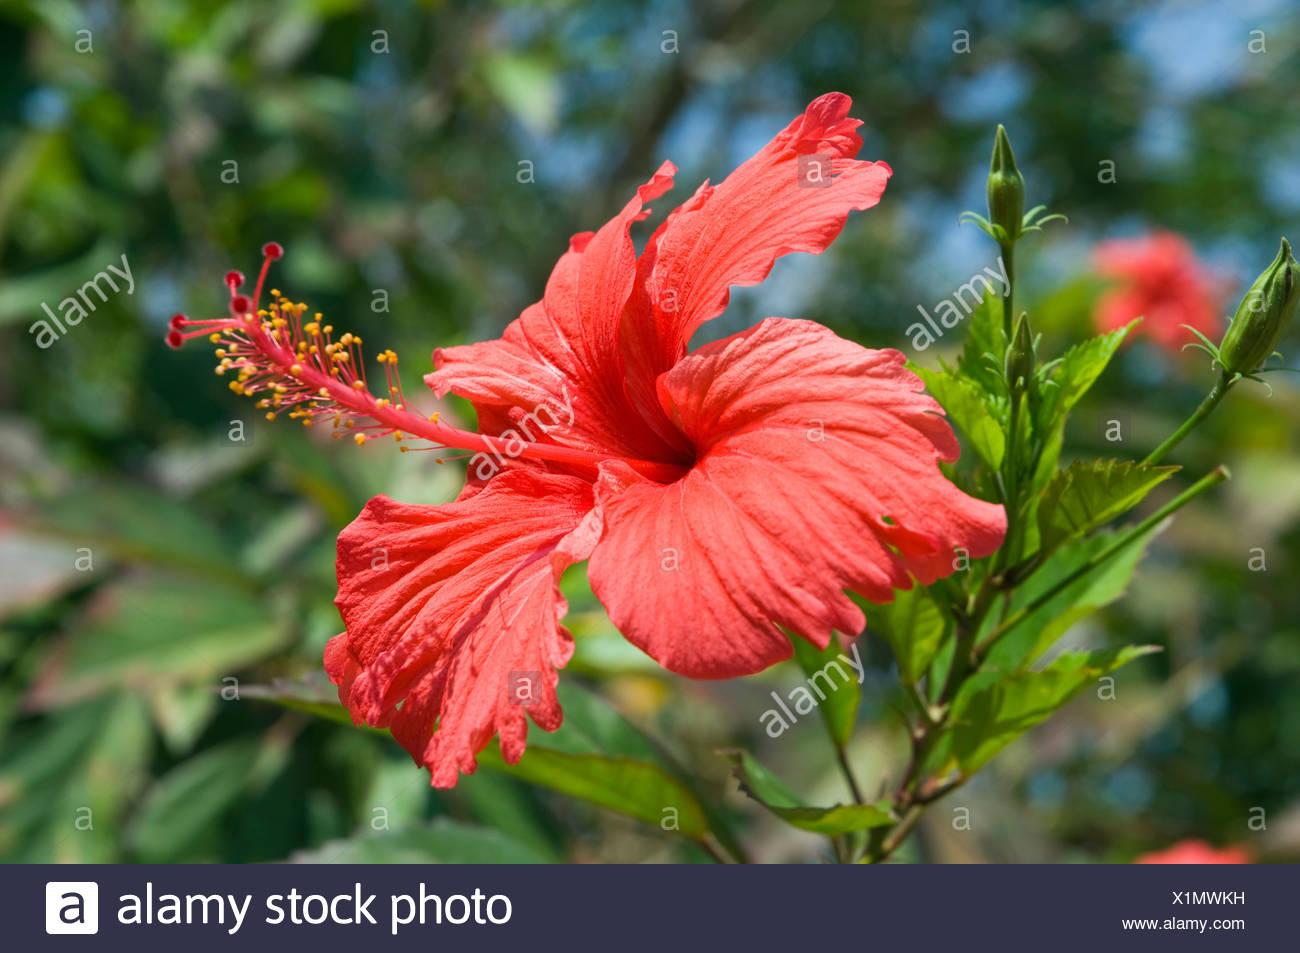 Hibiscus island stock photos hibiscus island stock images alamy red hibiscus flower hibiscus island of ko lanta koh lanta krabi izmirmasajfo Gallery